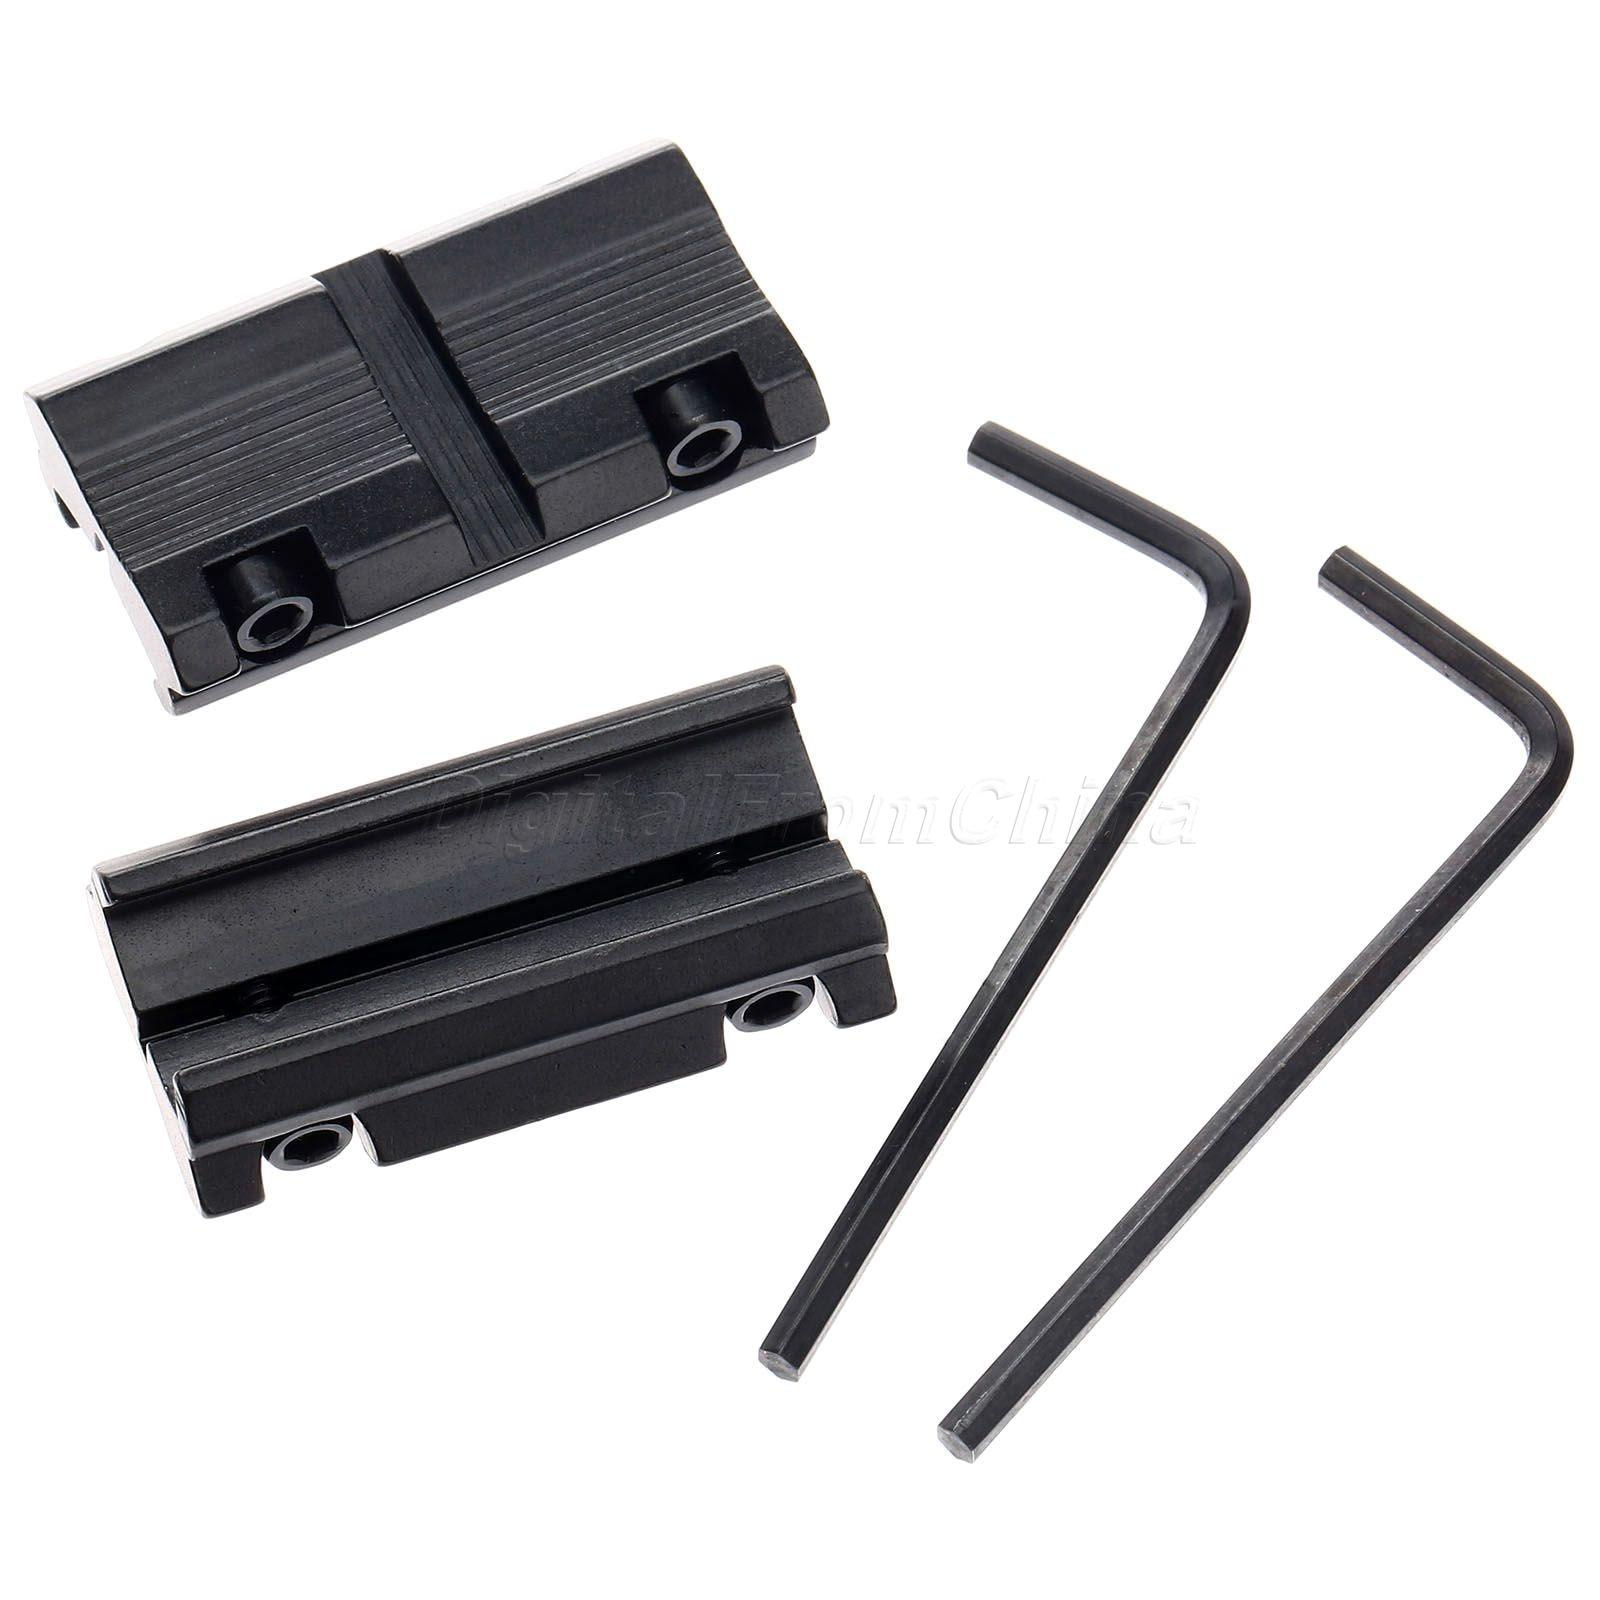 2 Unids Anillo Convertidor Con 3/8 11mm Dovetail A 7/8 20mm Weaver Rail Adaptador de Caza Accesorios de Bajo Perfil Alcance montajes 1 par